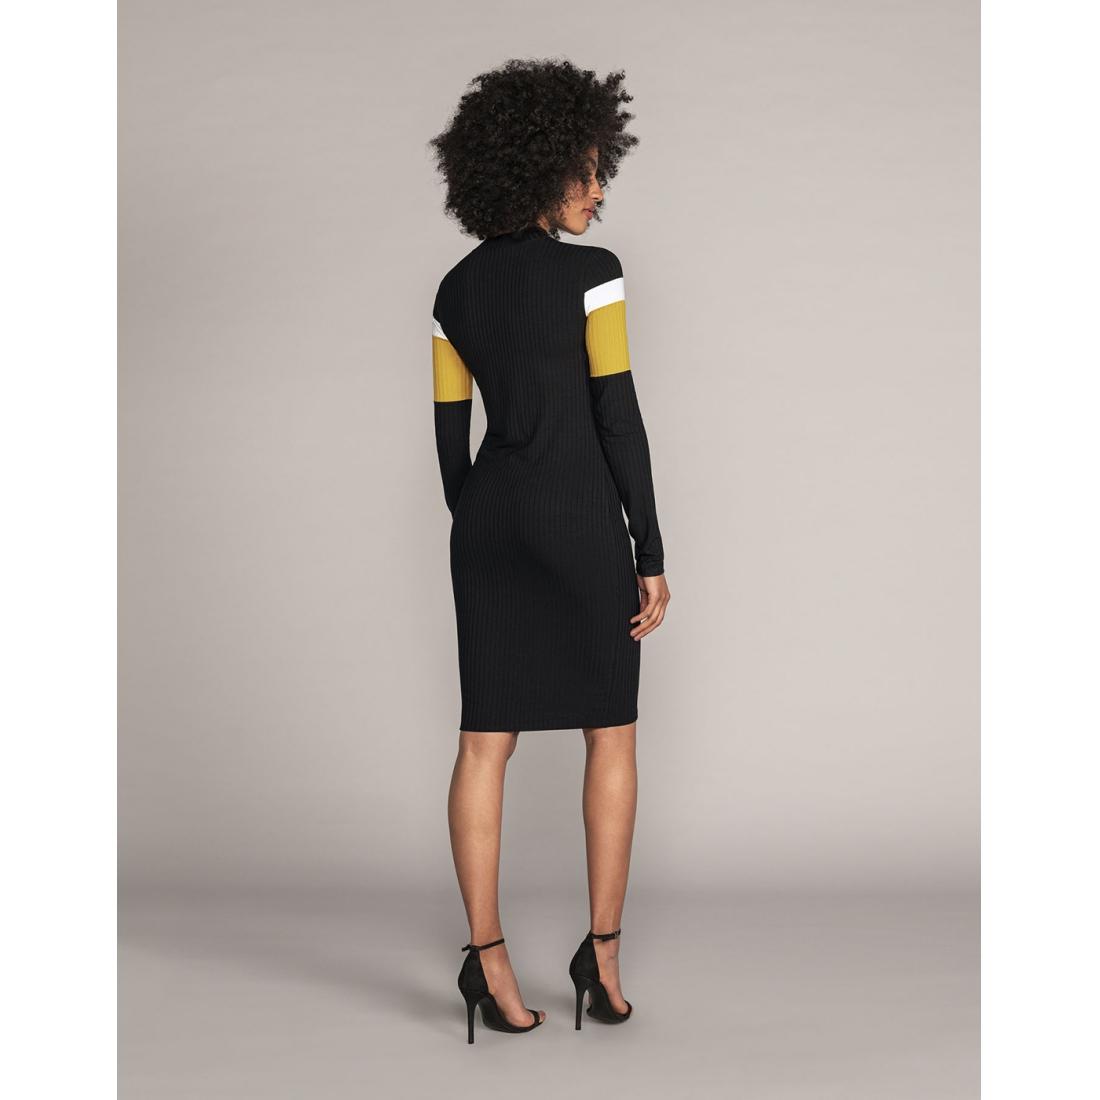 Vestido Malha Canelado Tracy Preto Reativo Lunender